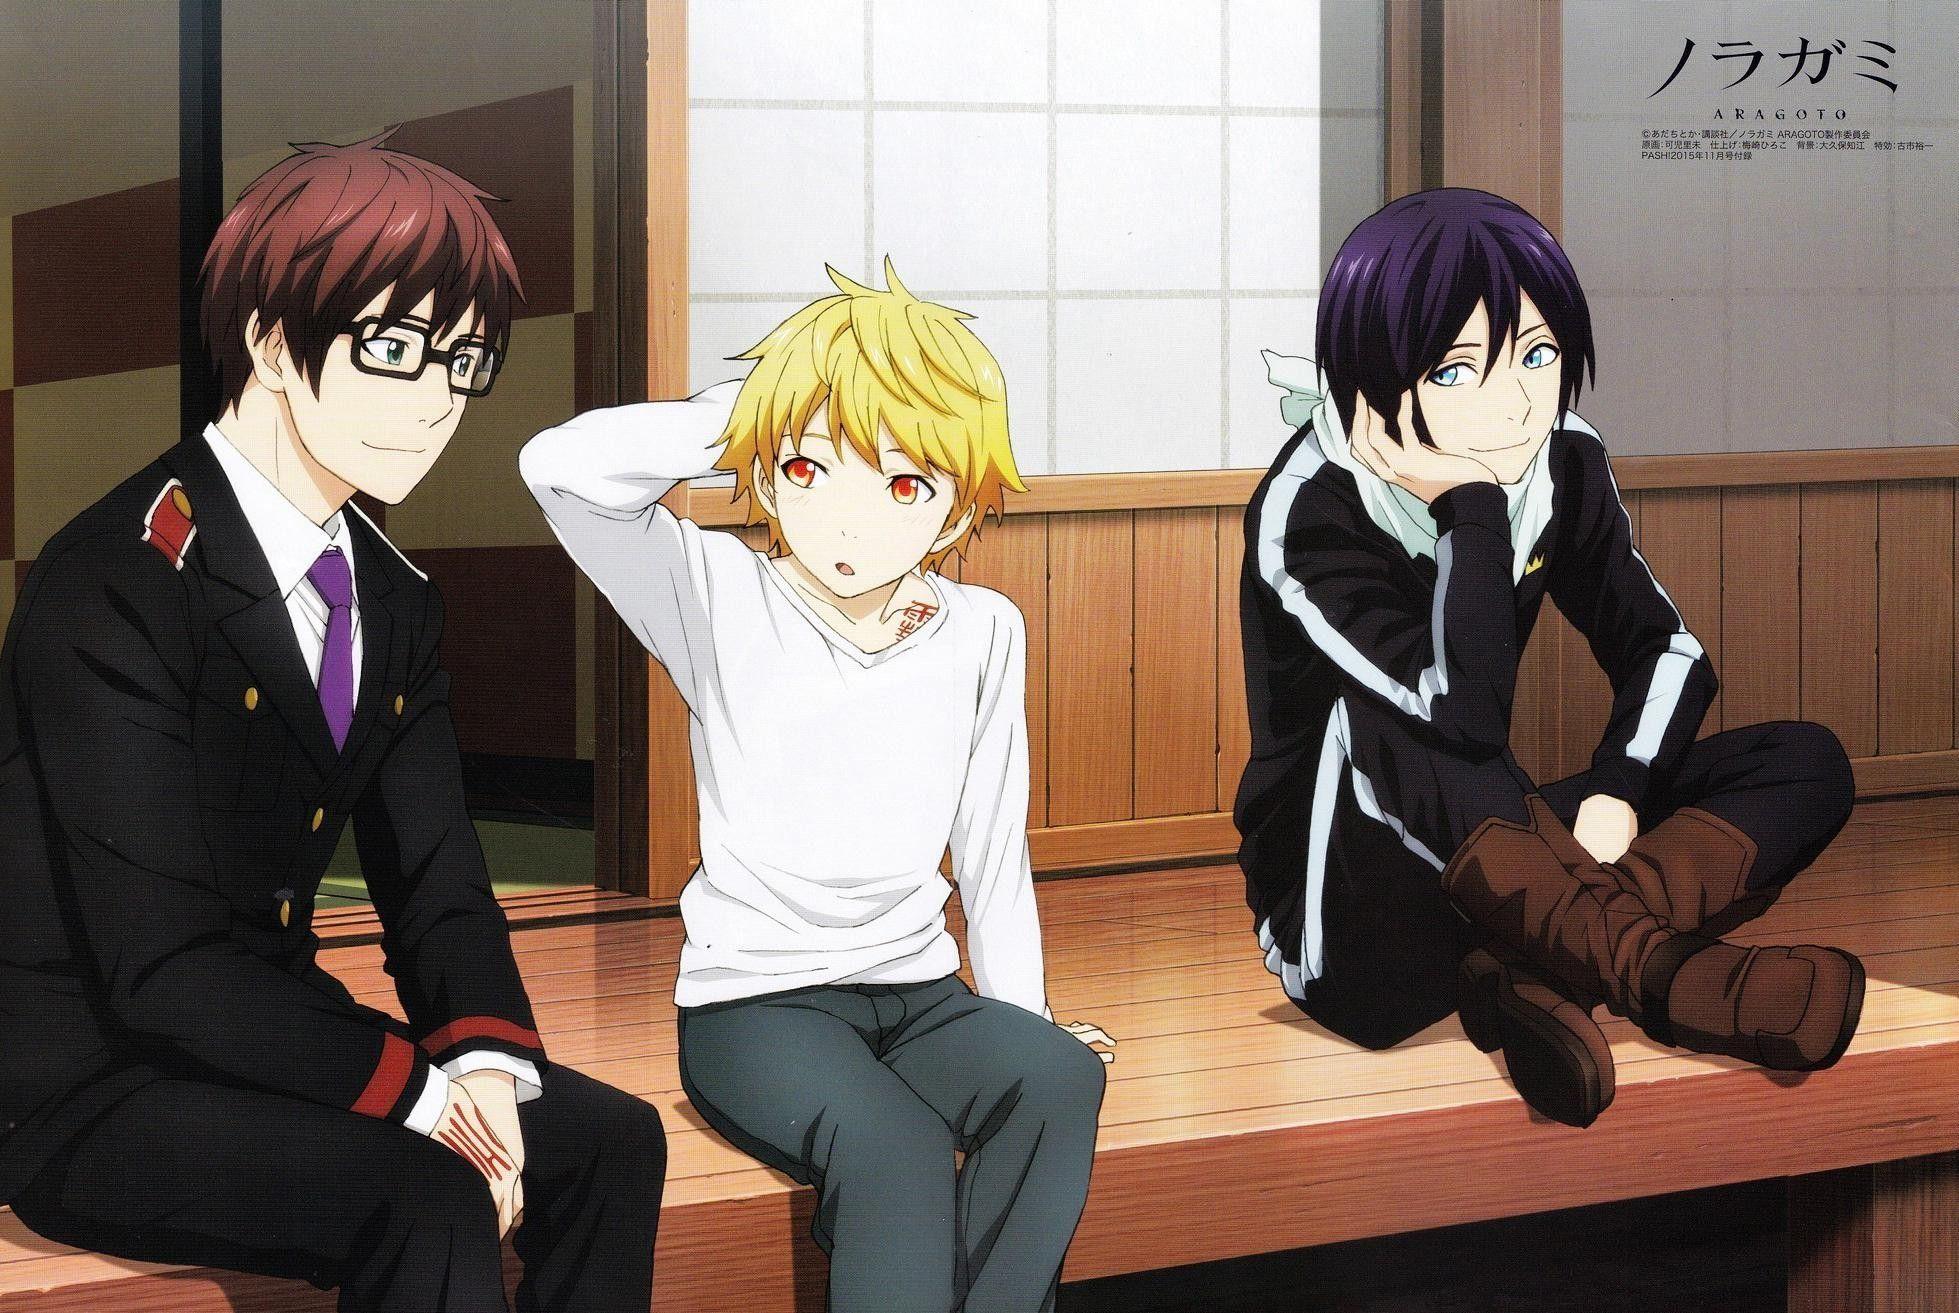 Image__14338 Noragami aragoto, Anime noragami, Anime